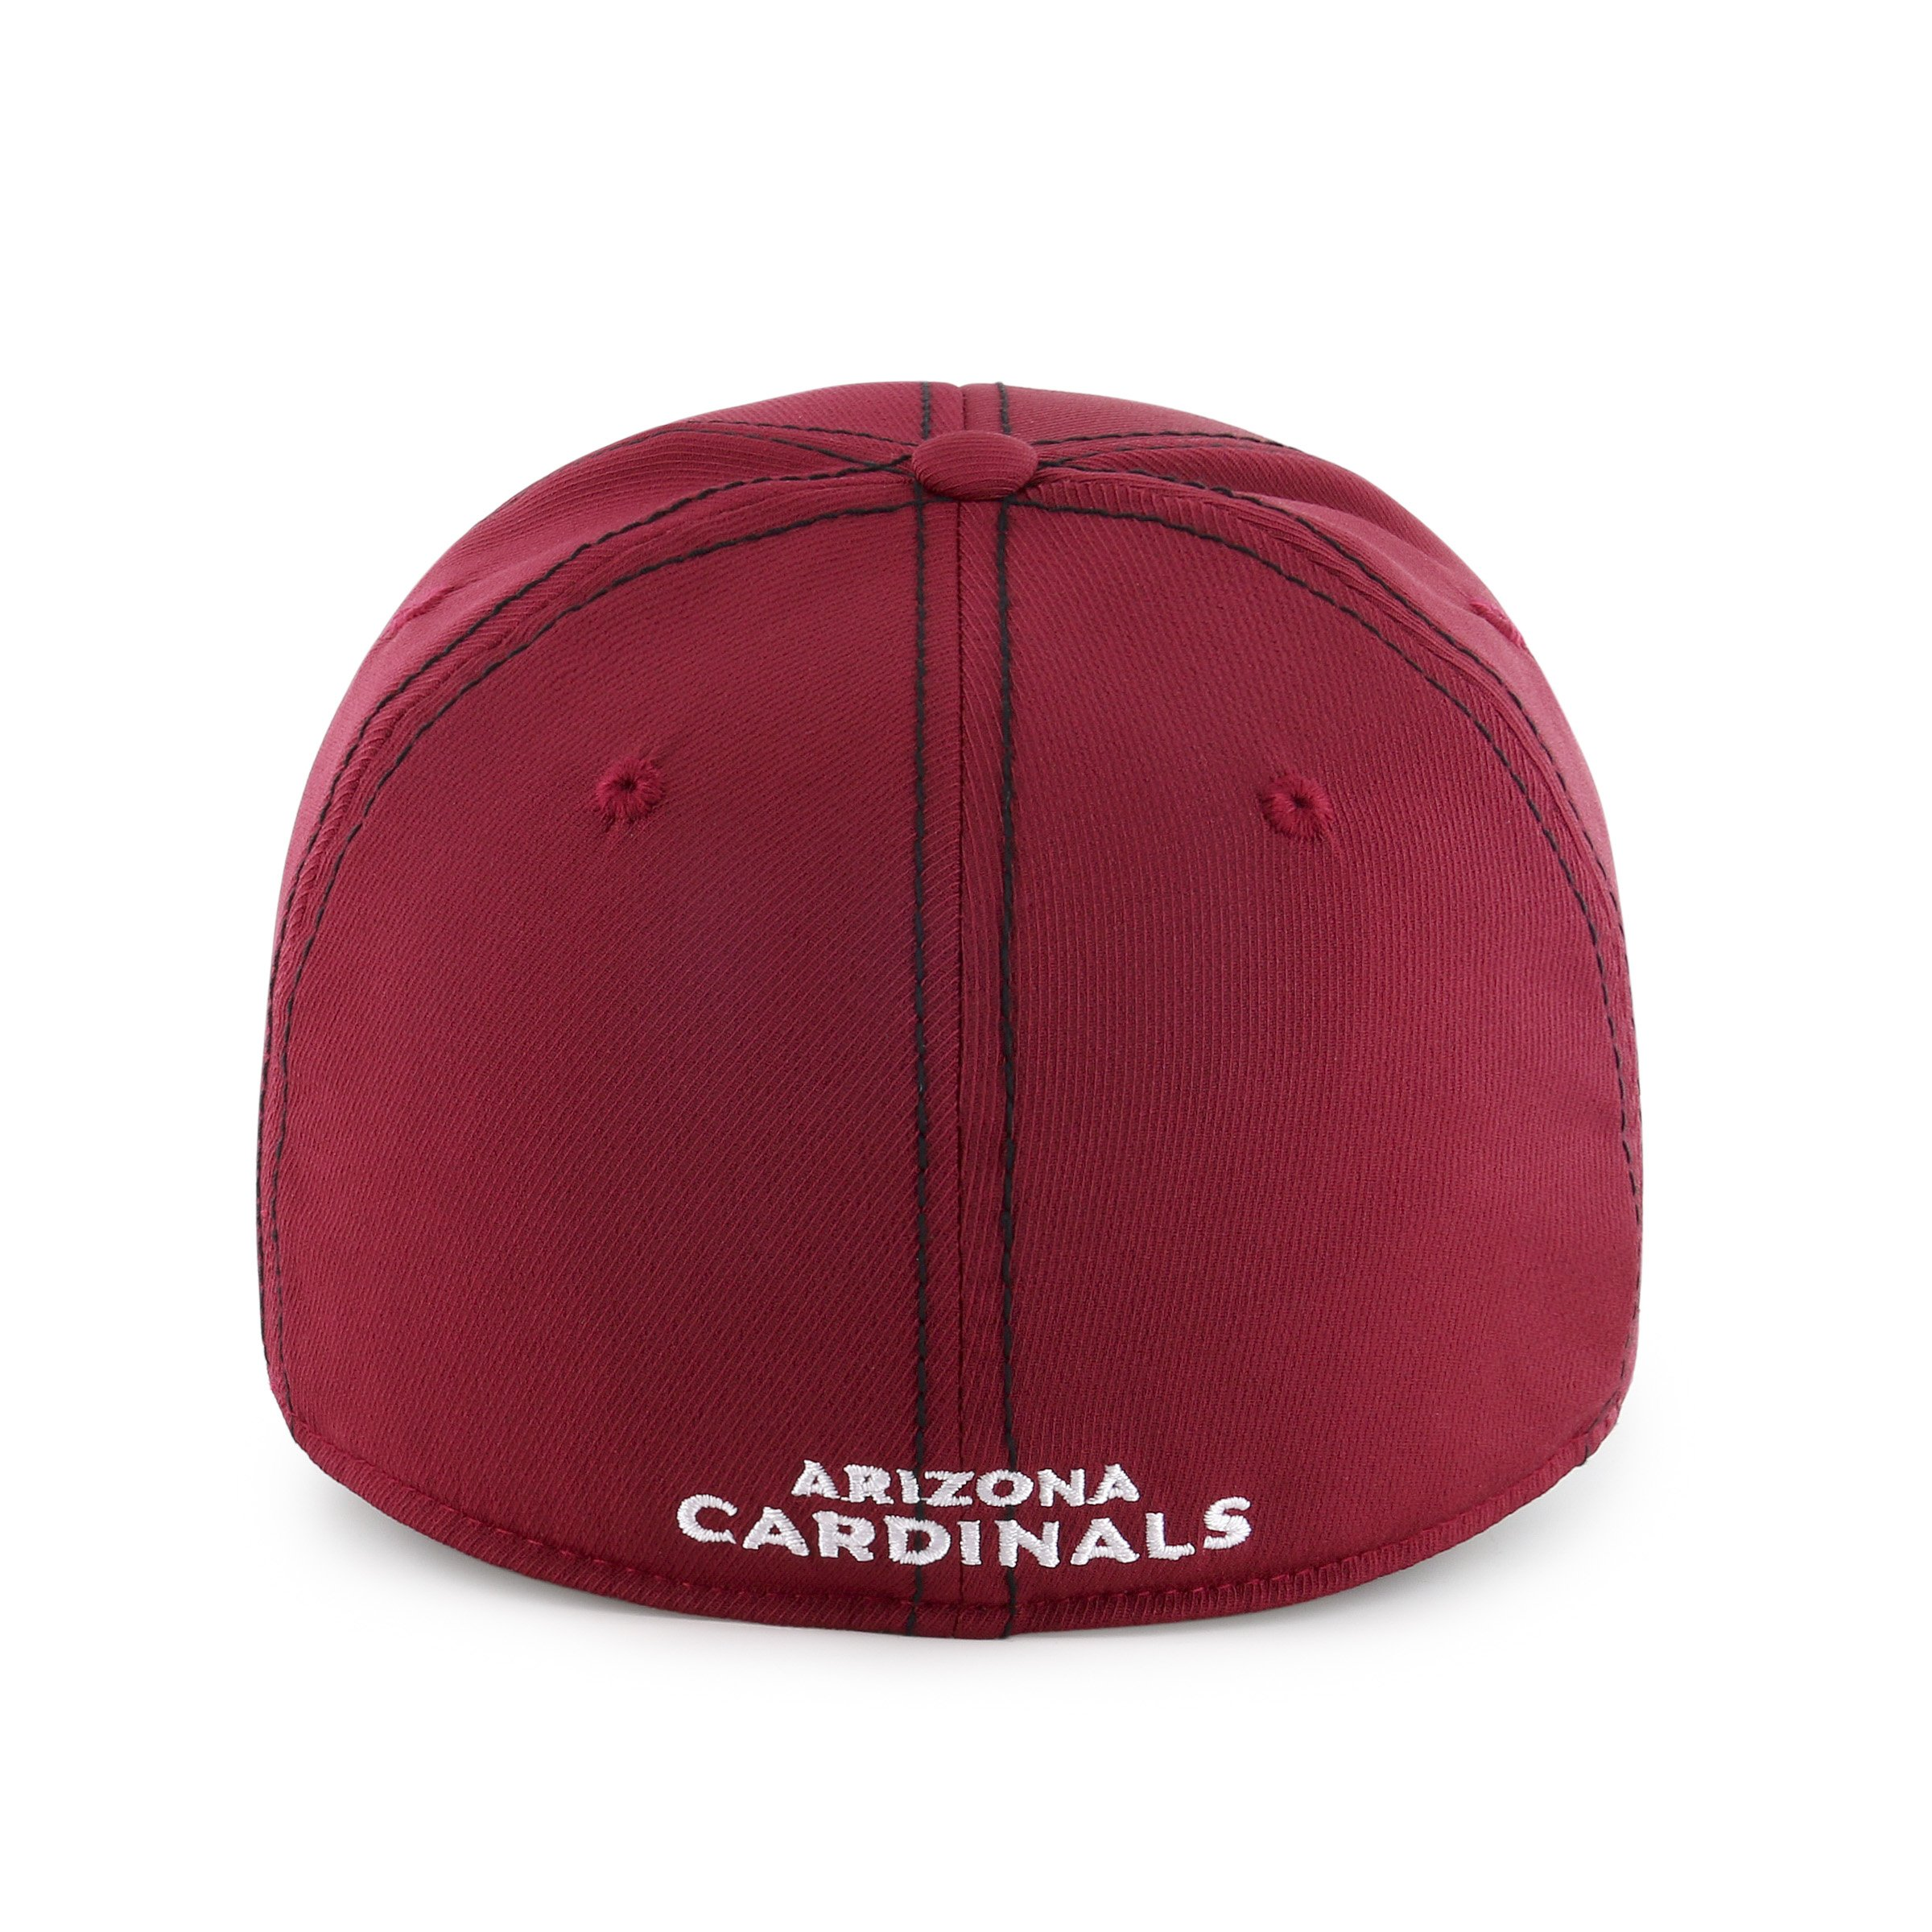 NFL Men's OTS Start Line Center Stretch Fit Hat 2